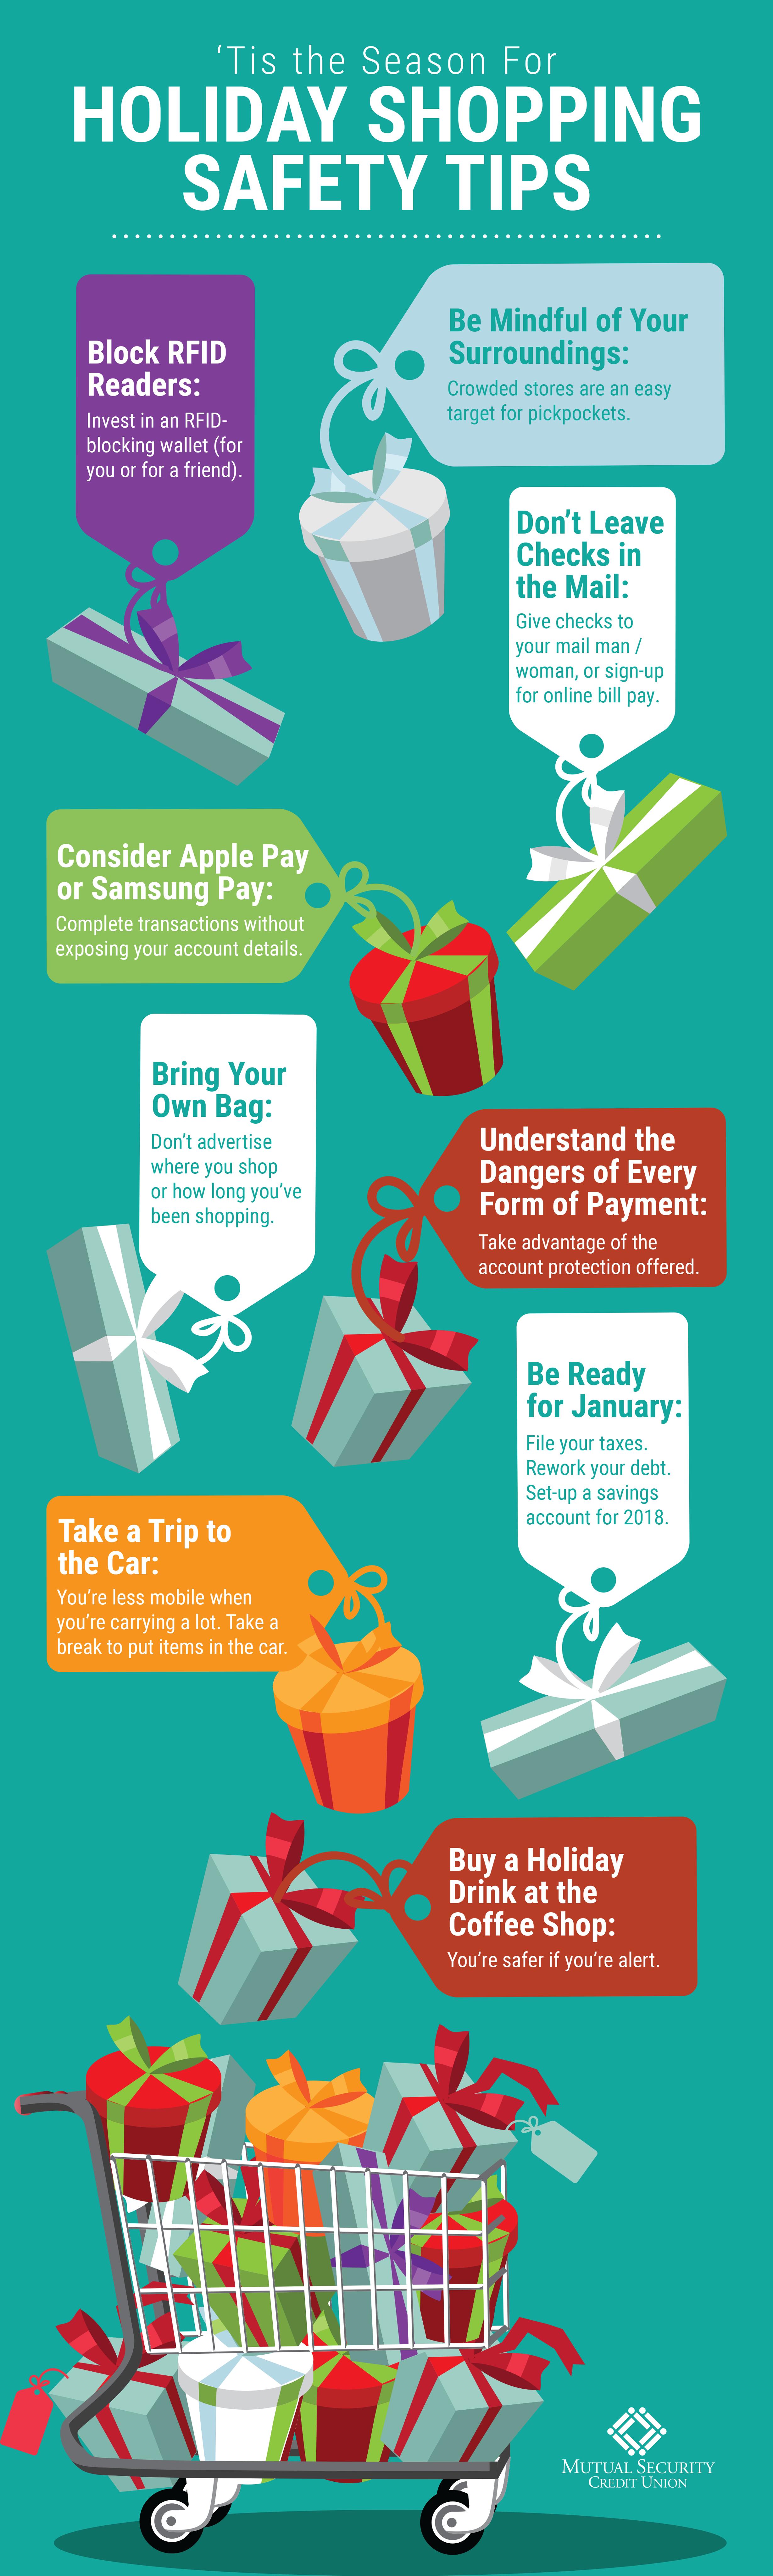 HolidayShoppingSafety_Infographic.png